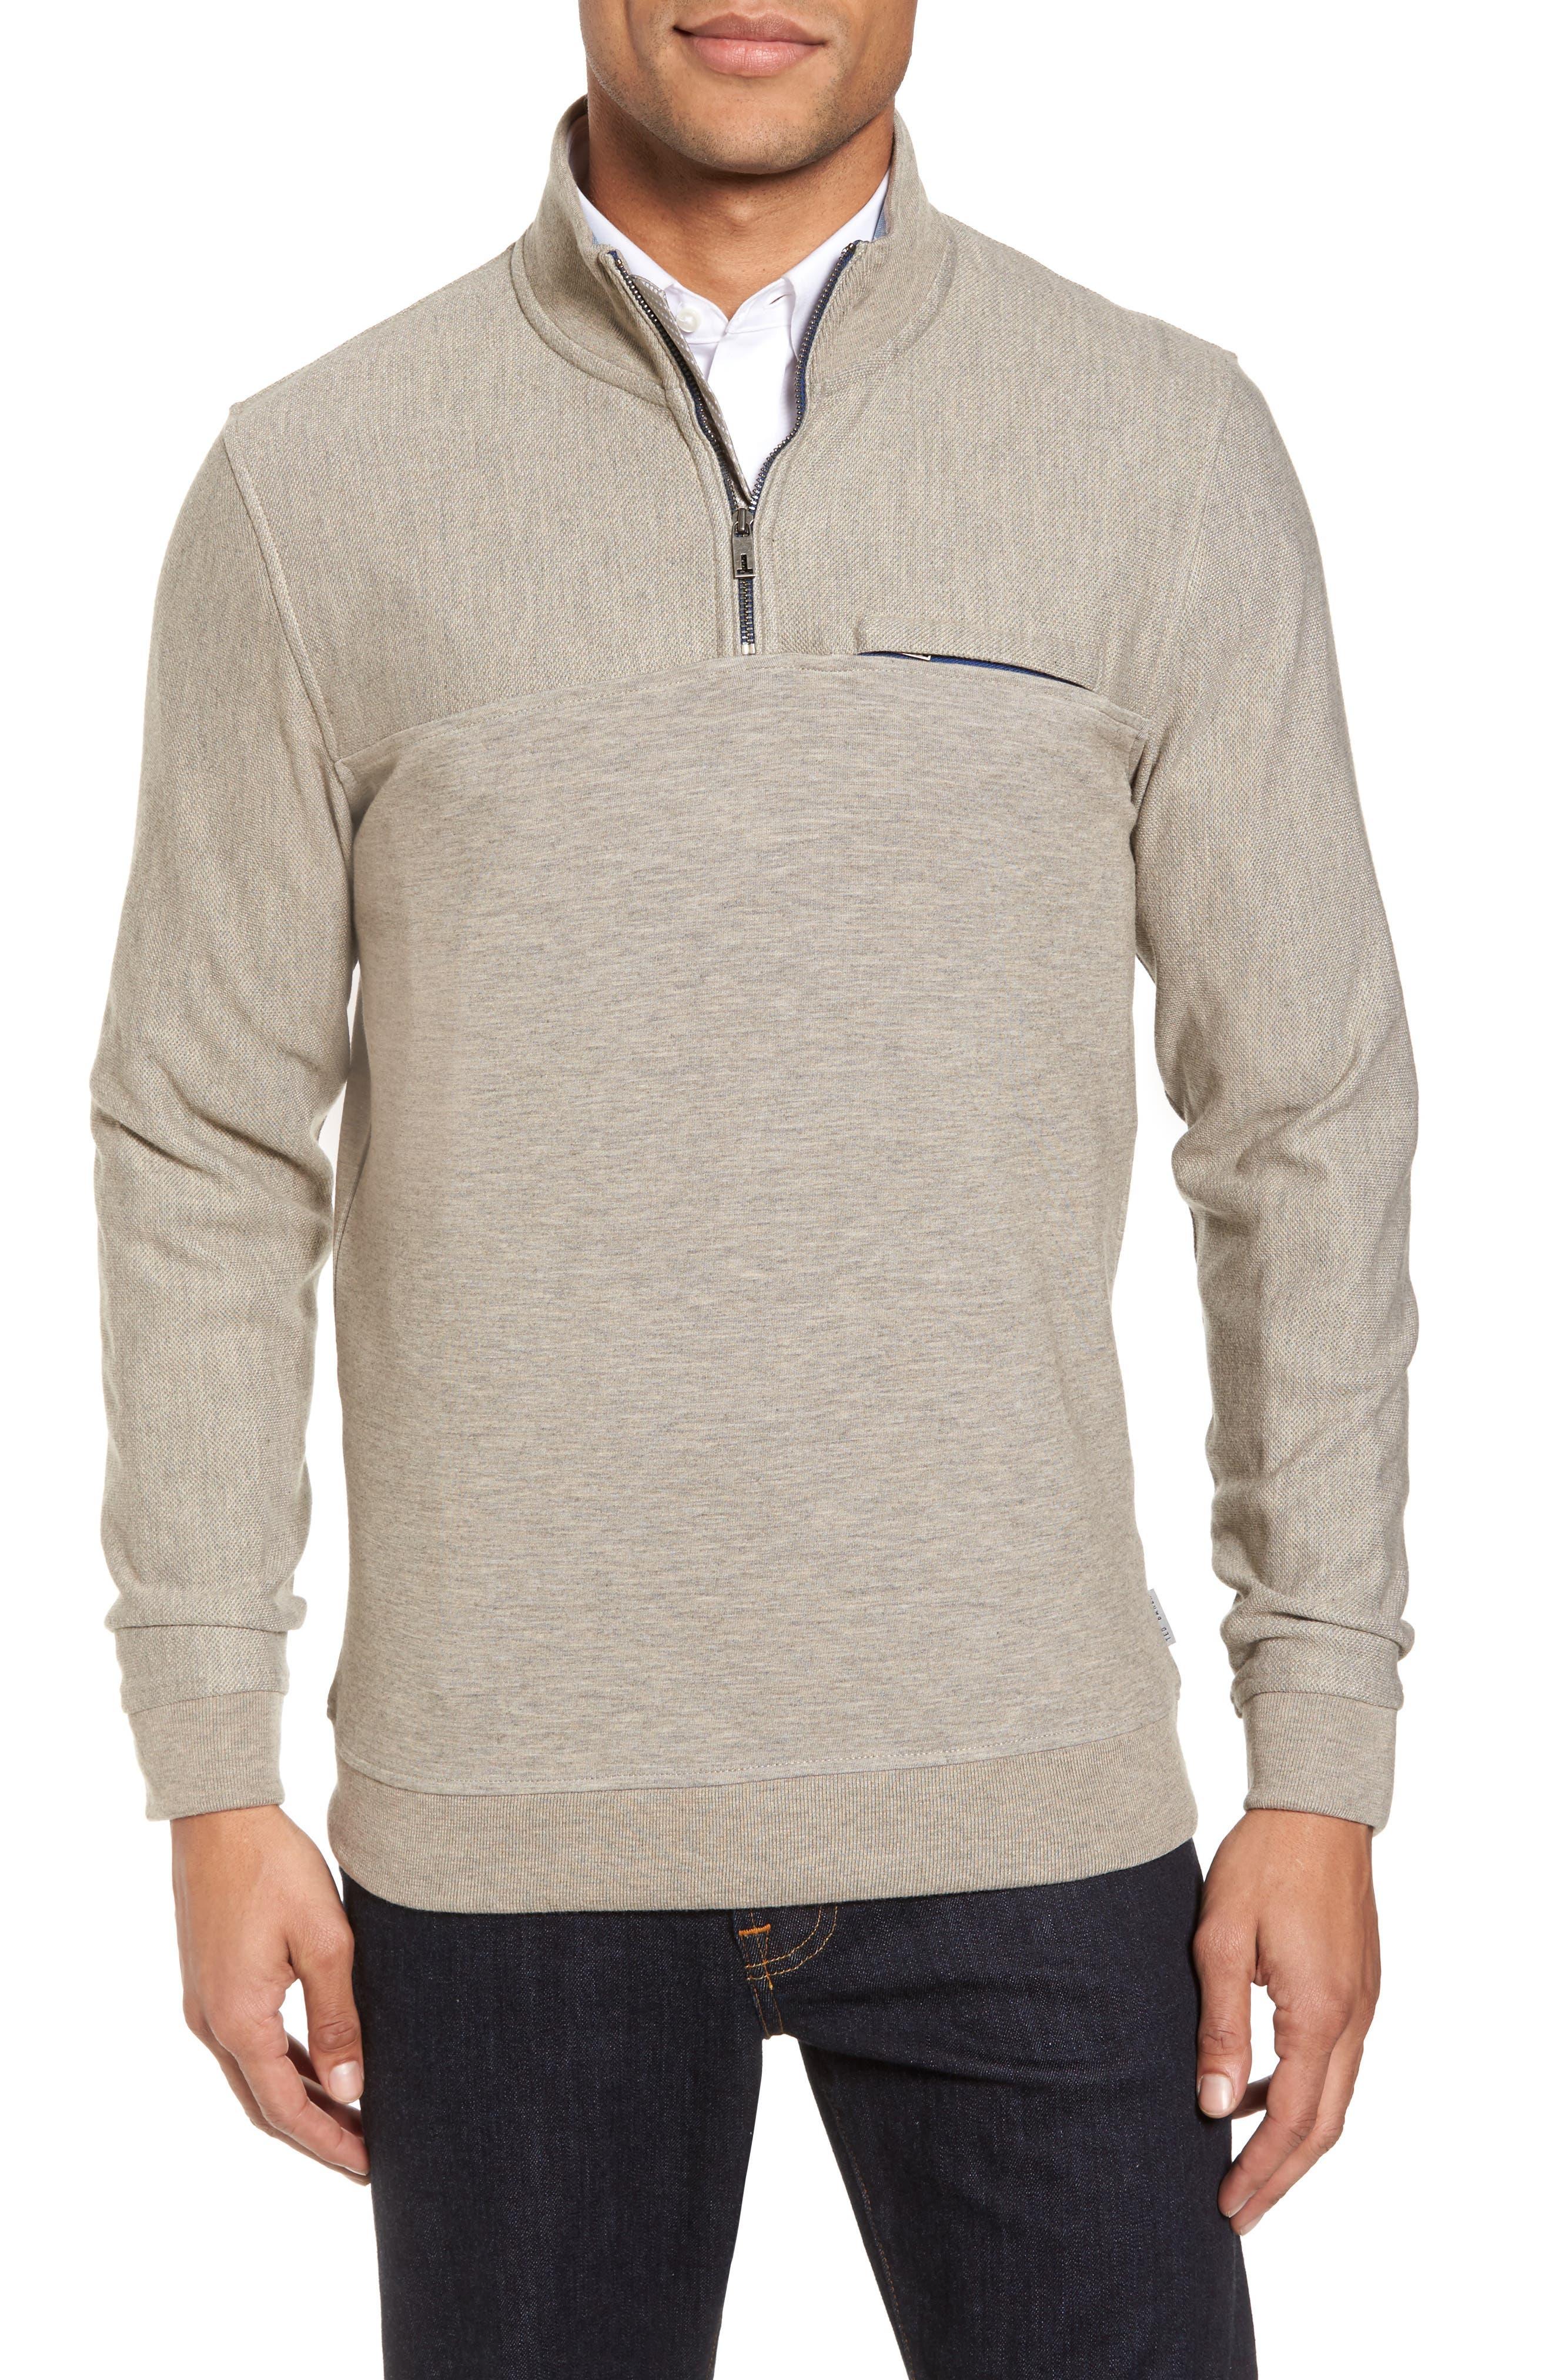 Main Image - Ted Baker London Livstay Slim Fit Quarter Zip Pullover